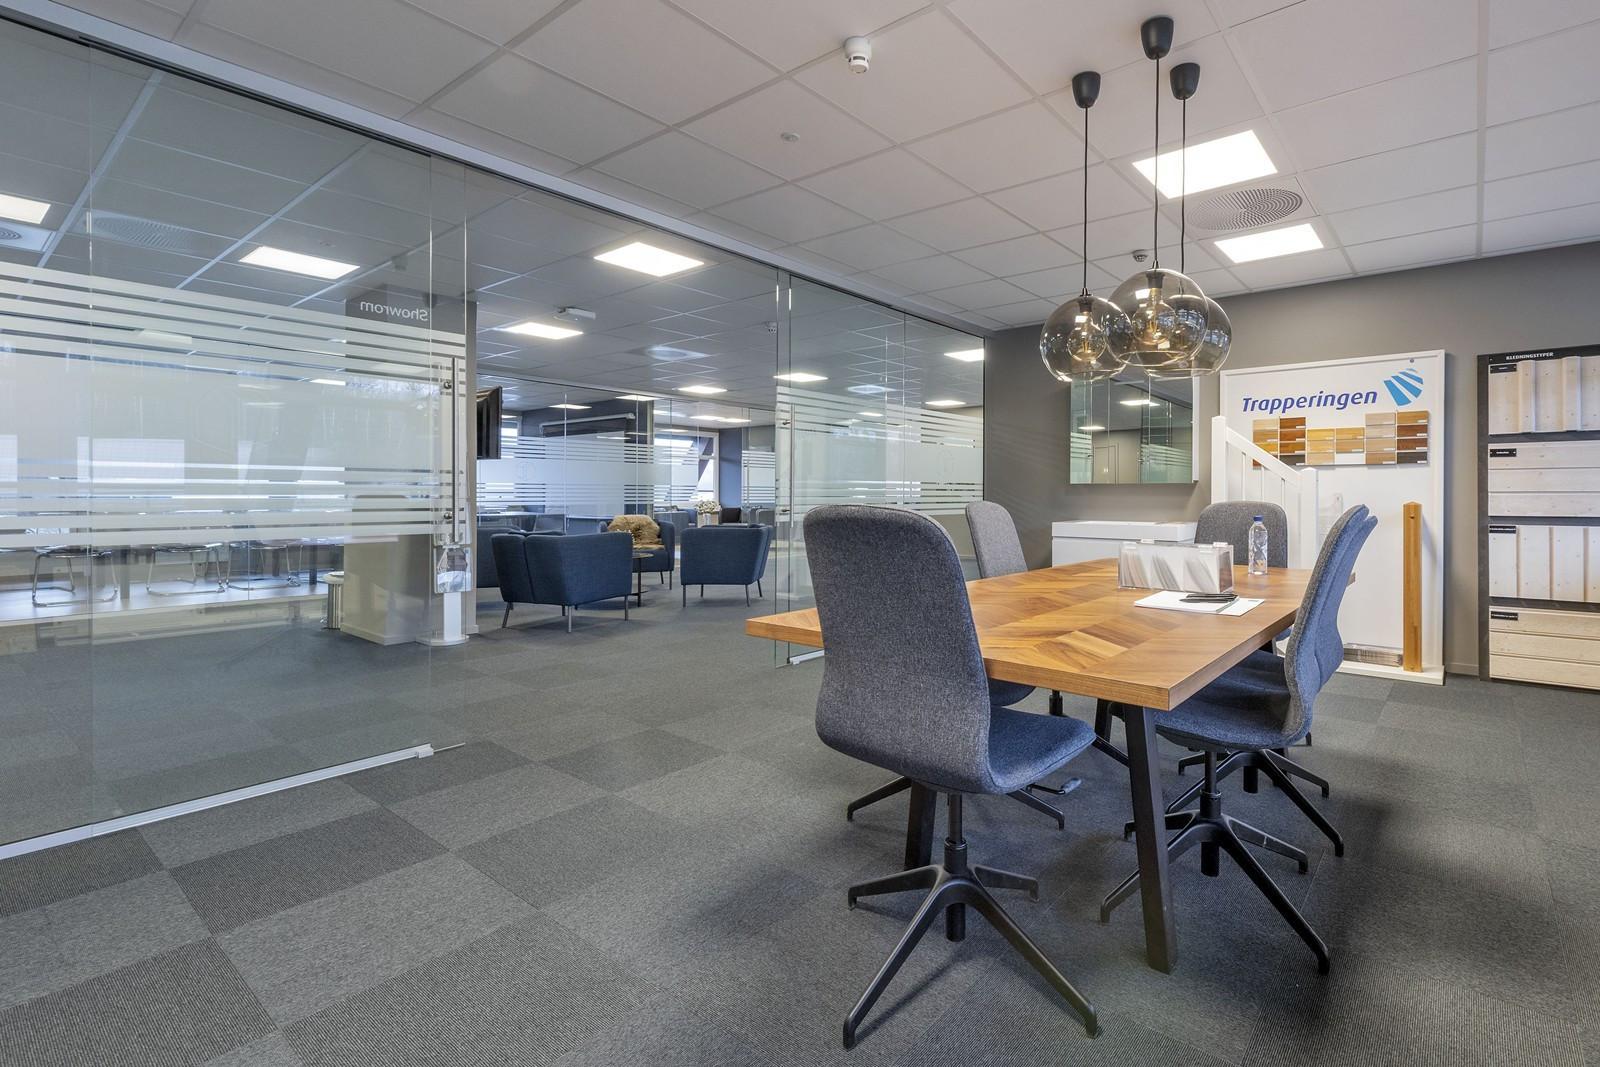 Kontor/møterom